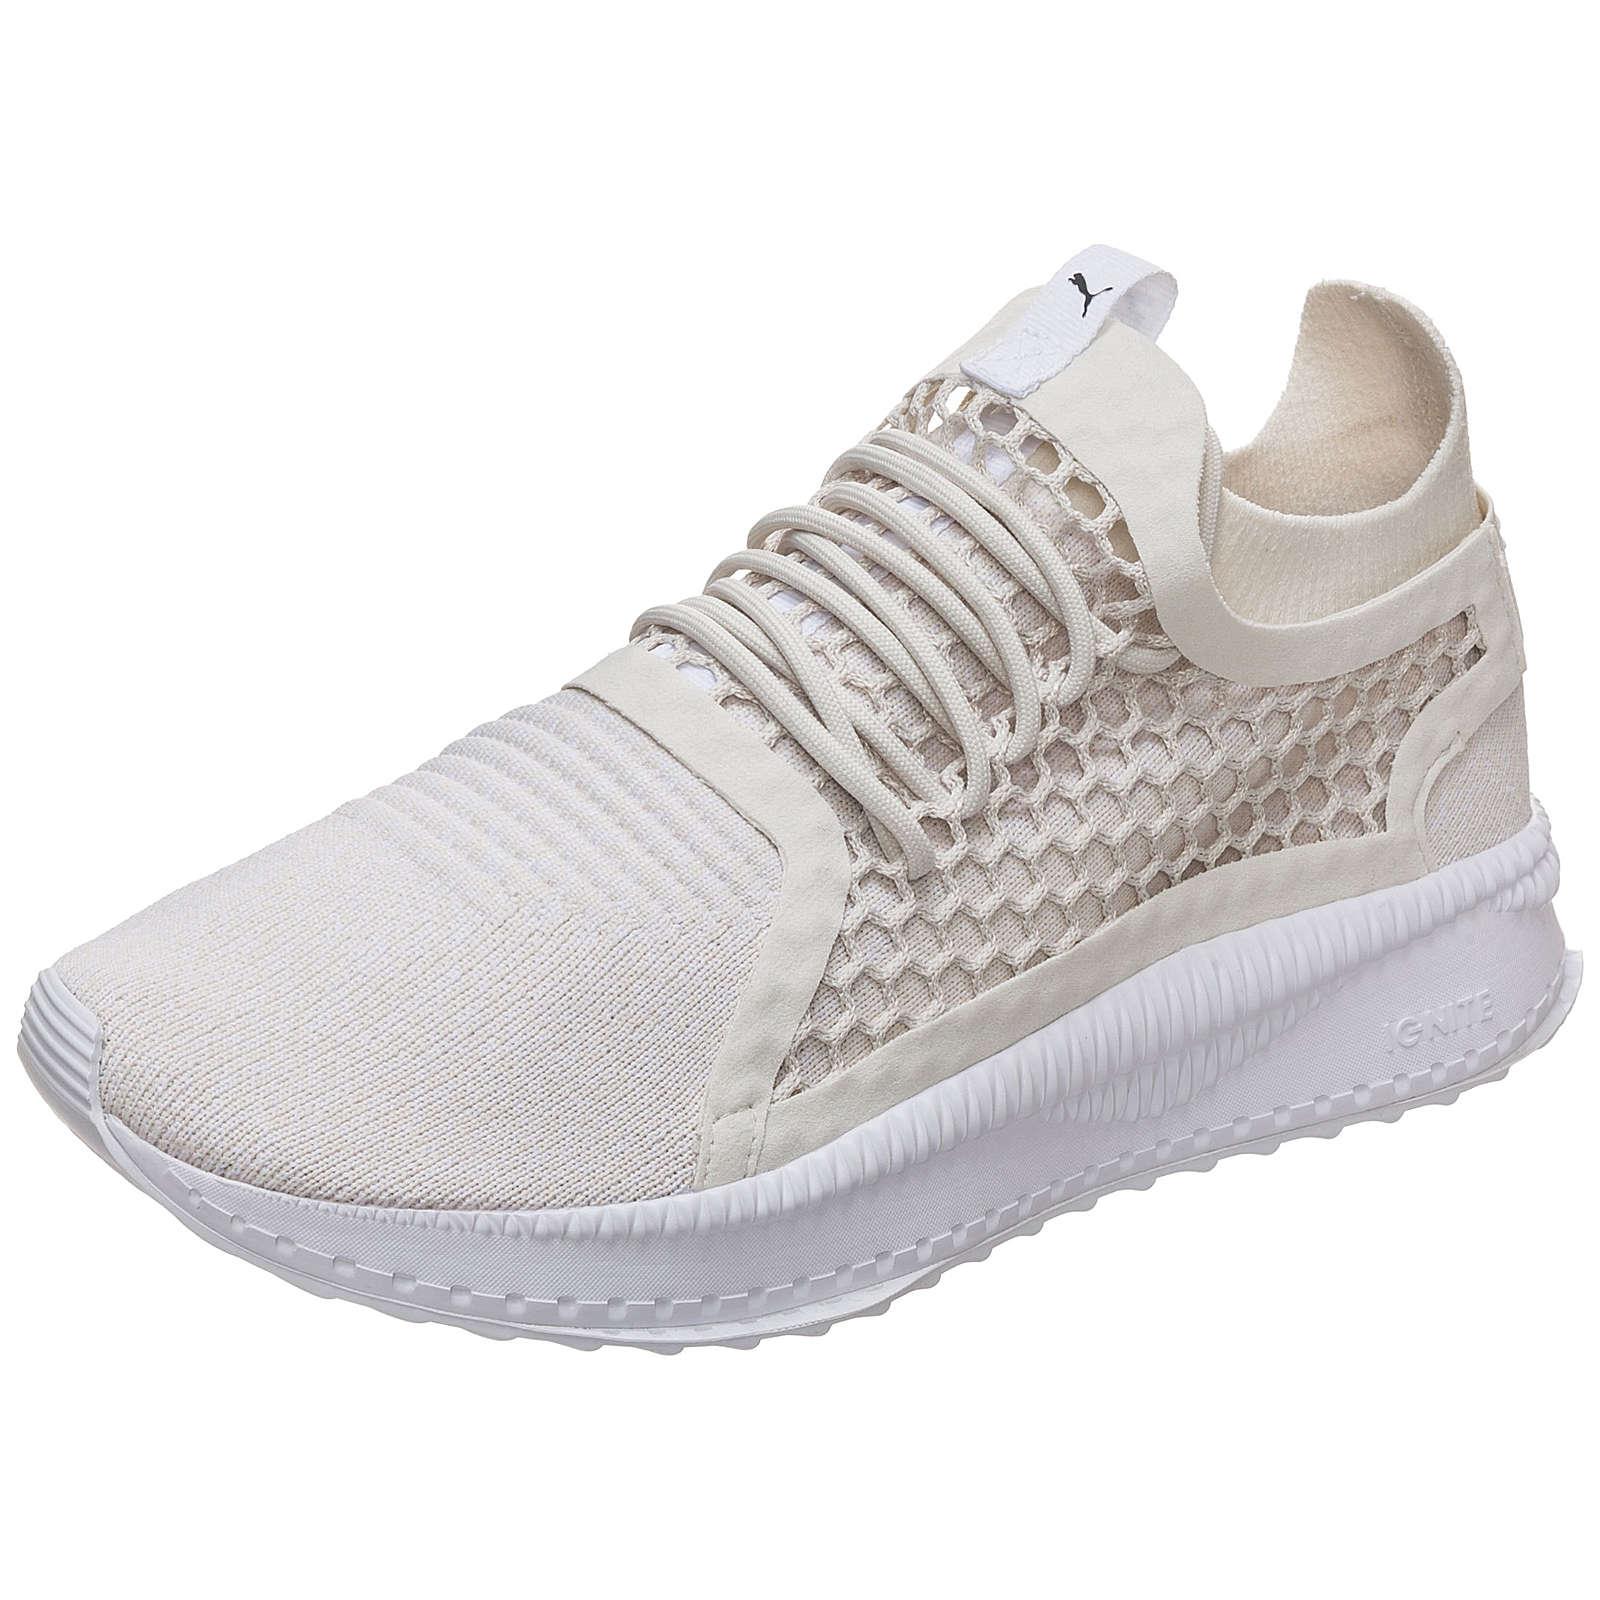 PUMA TSUGI Netfit v2 evoKNIT Sneakers Low weiß Gr. 40,5